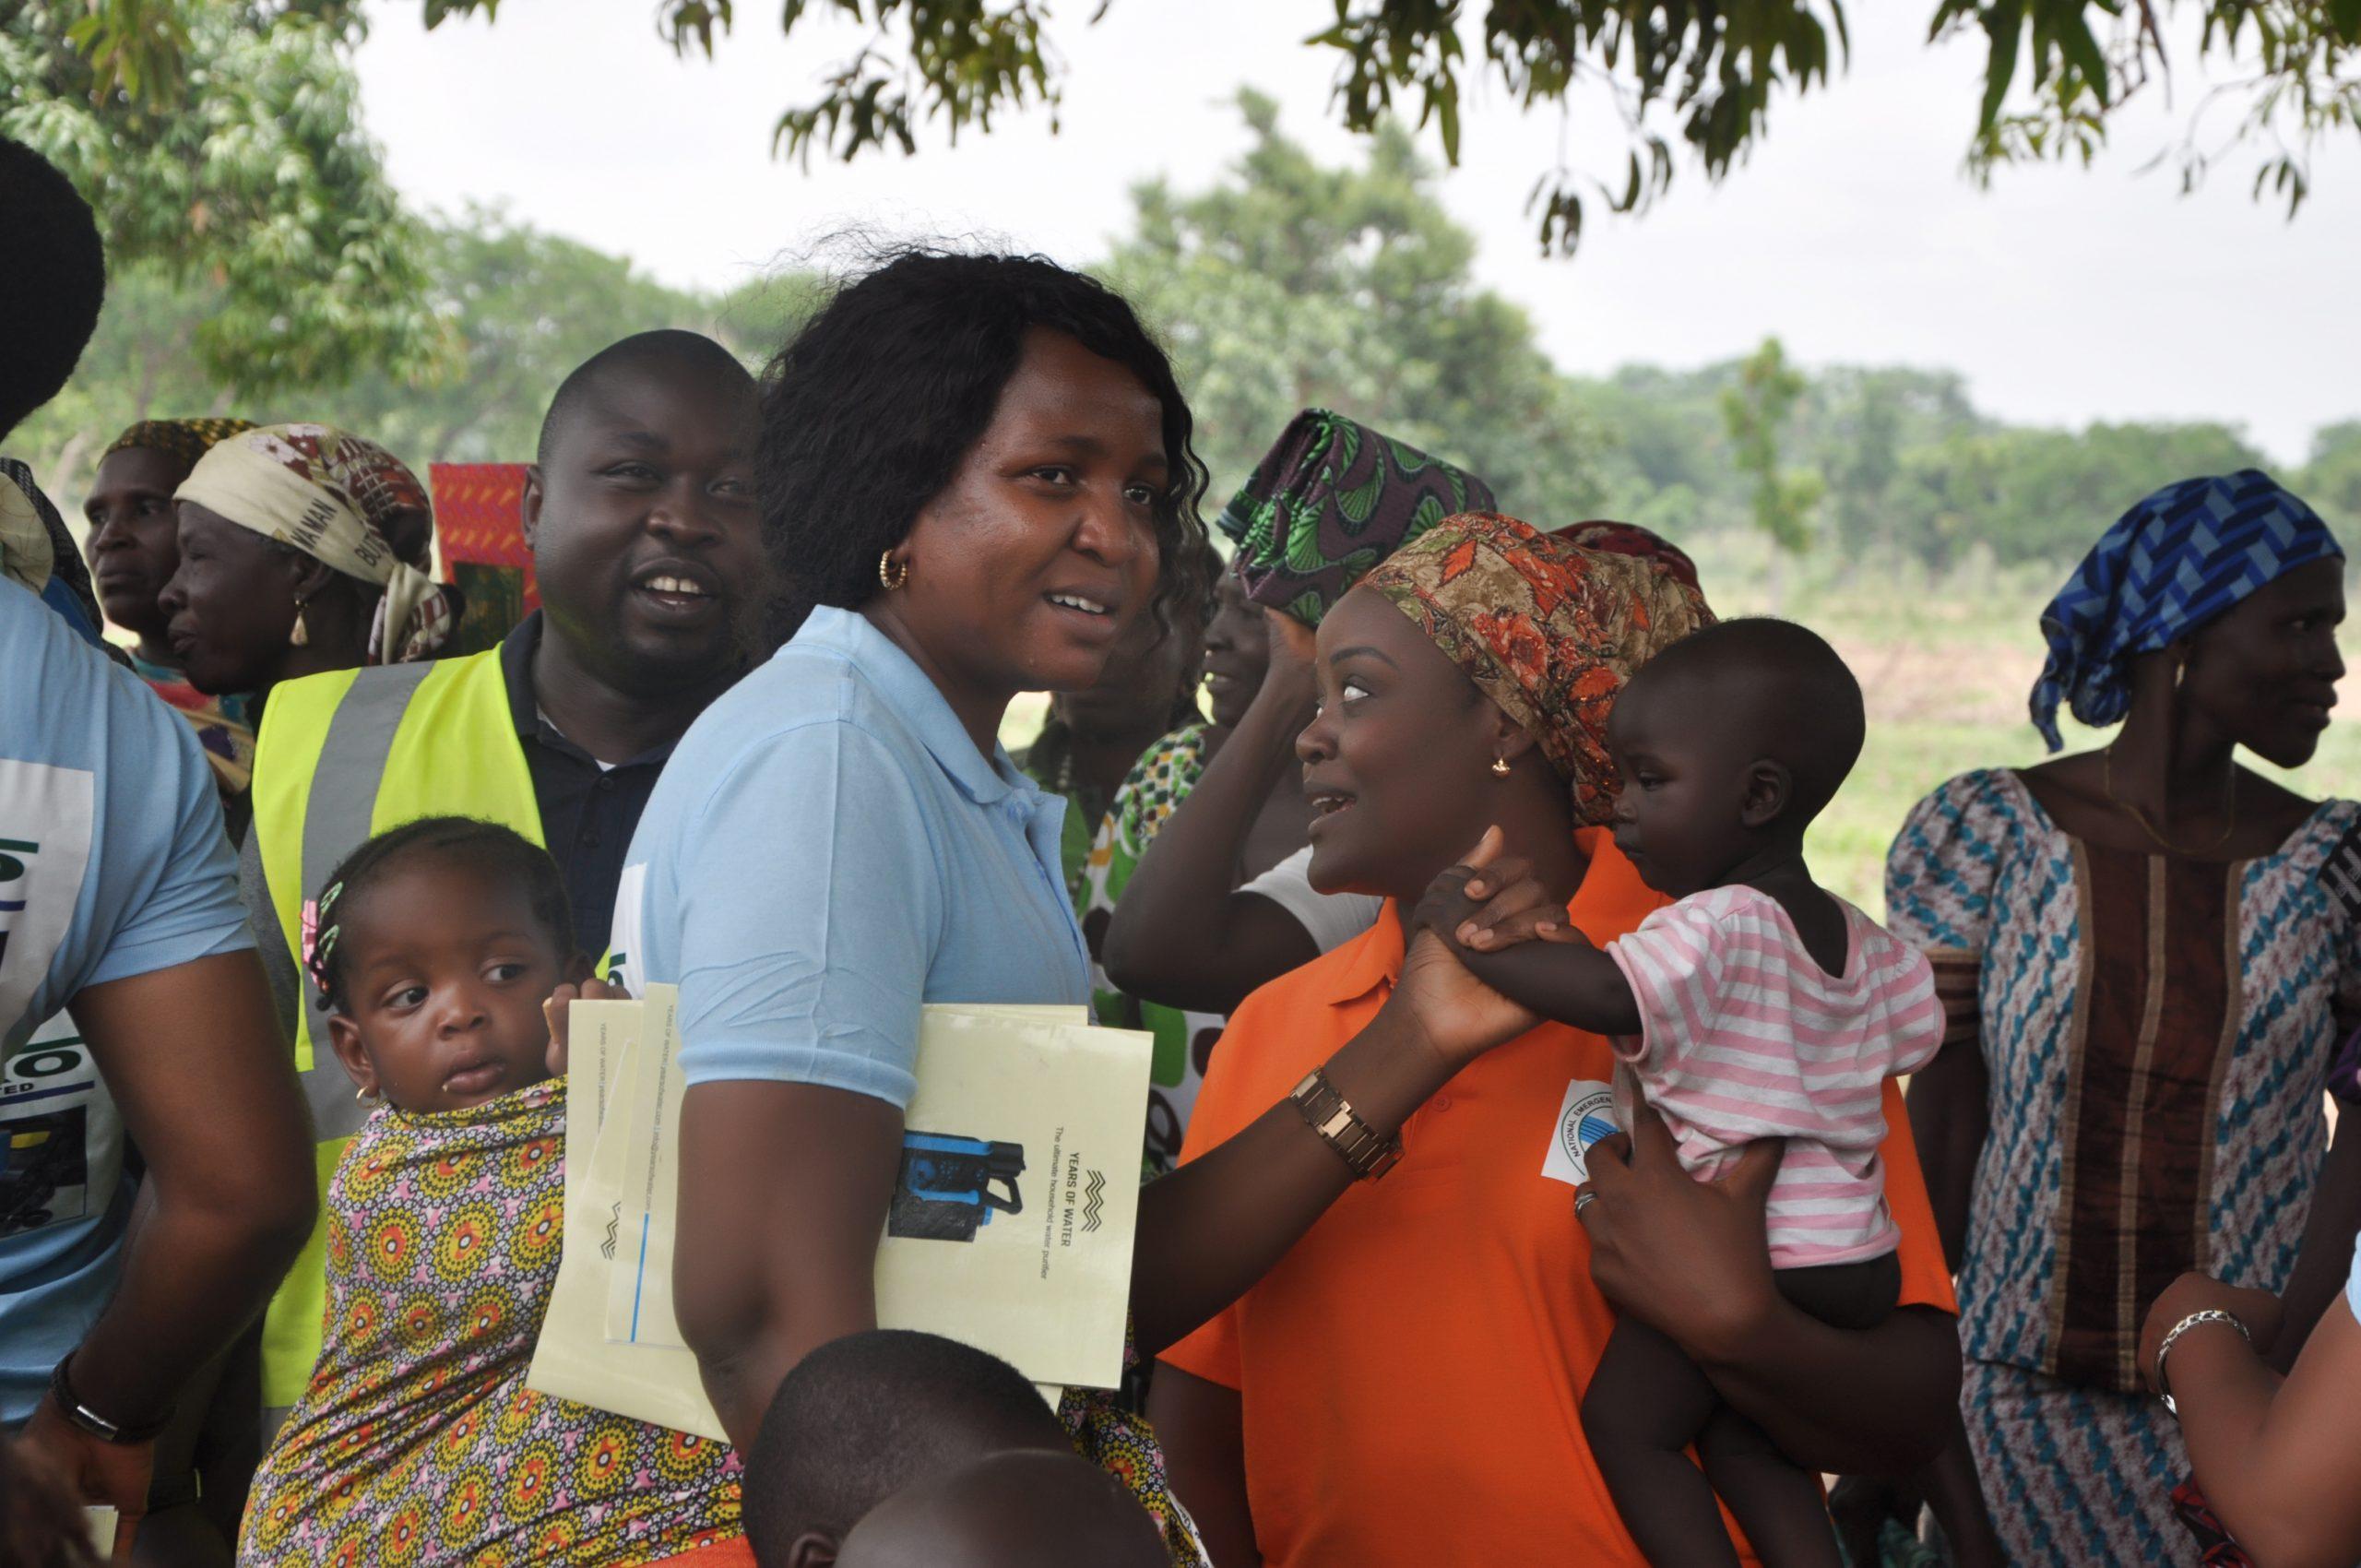 National Secretary; Oyin Okewoye interacting with the children